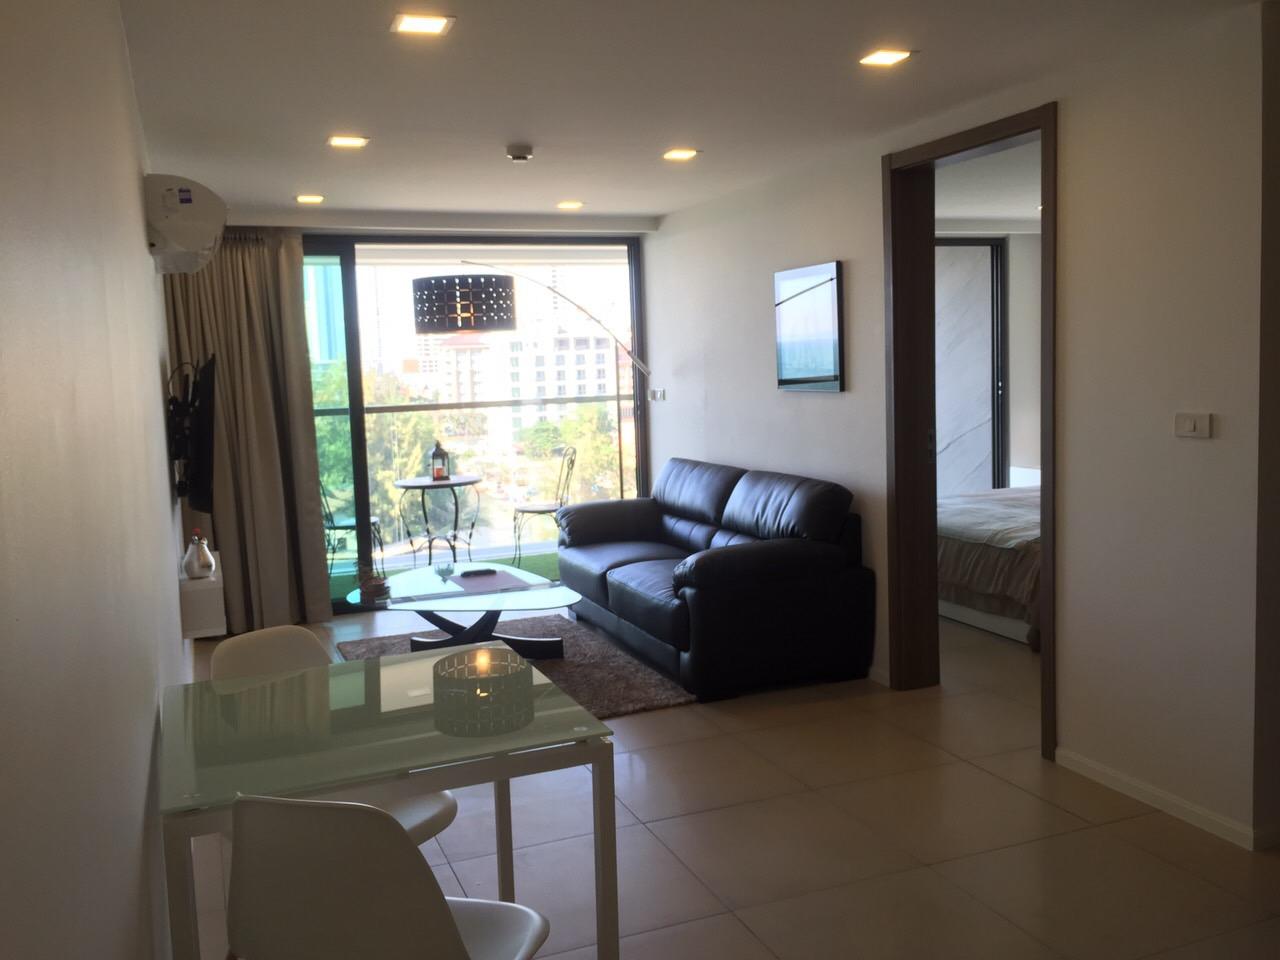 芭堤雅 - Waters Edge Pattaya Condominium 01